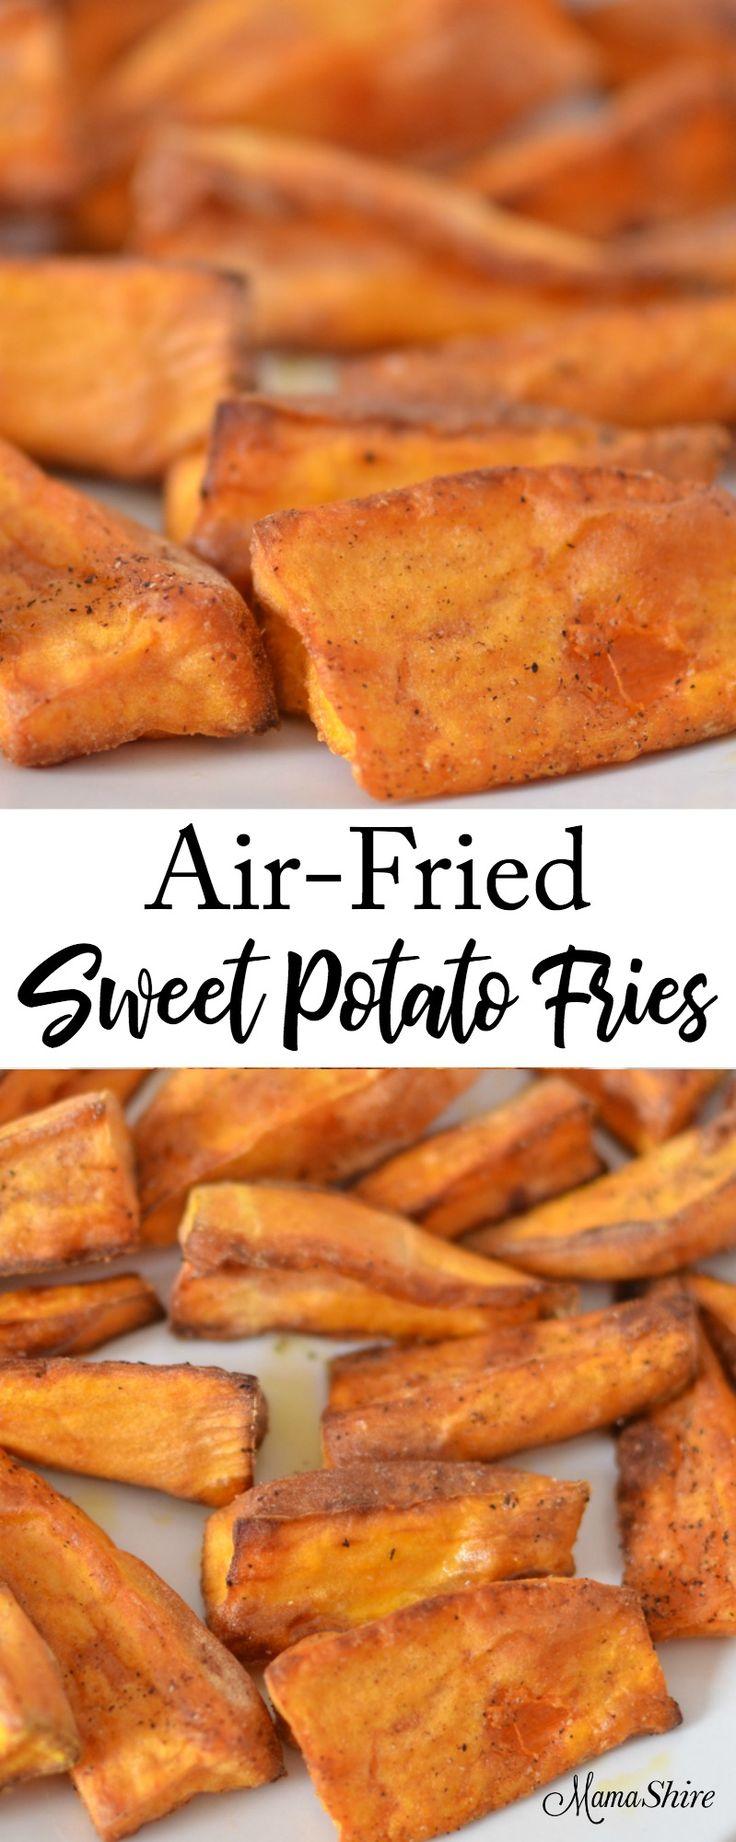 Air-Fried Sweet Potato Fries - Crispy on the outside, tender on the inside! Gluten-free, Trim Healthy Mama-E #airfryerrecipes #sweetpotatofries #trimhealthymama #healthyrecipes